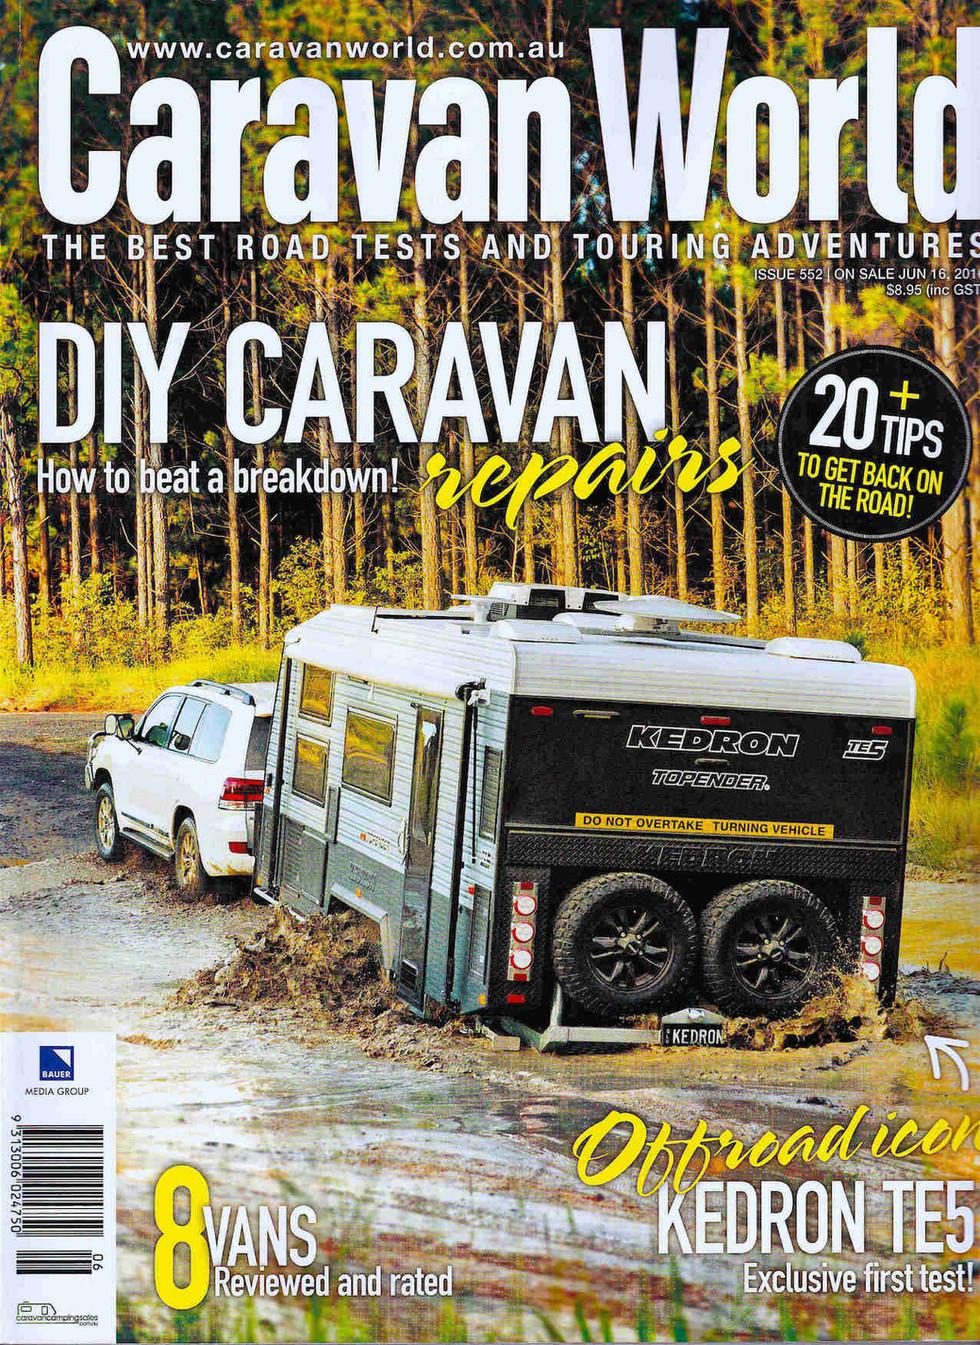 Caravan World July 2016 - KEDRON Caravans - The Gall Boys ©️